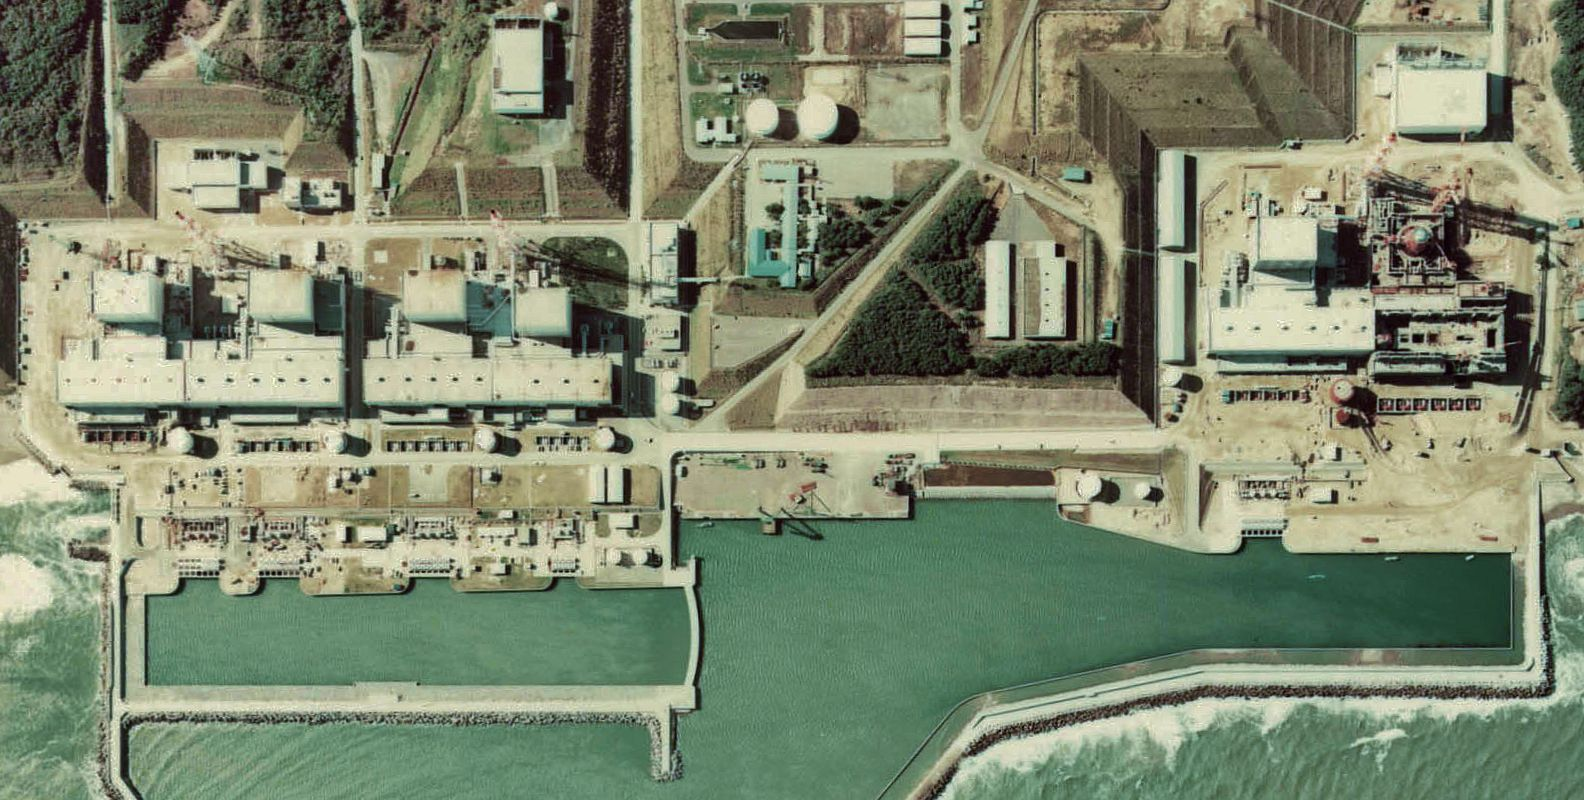 Vista aérea da central nuclear de Fukushima